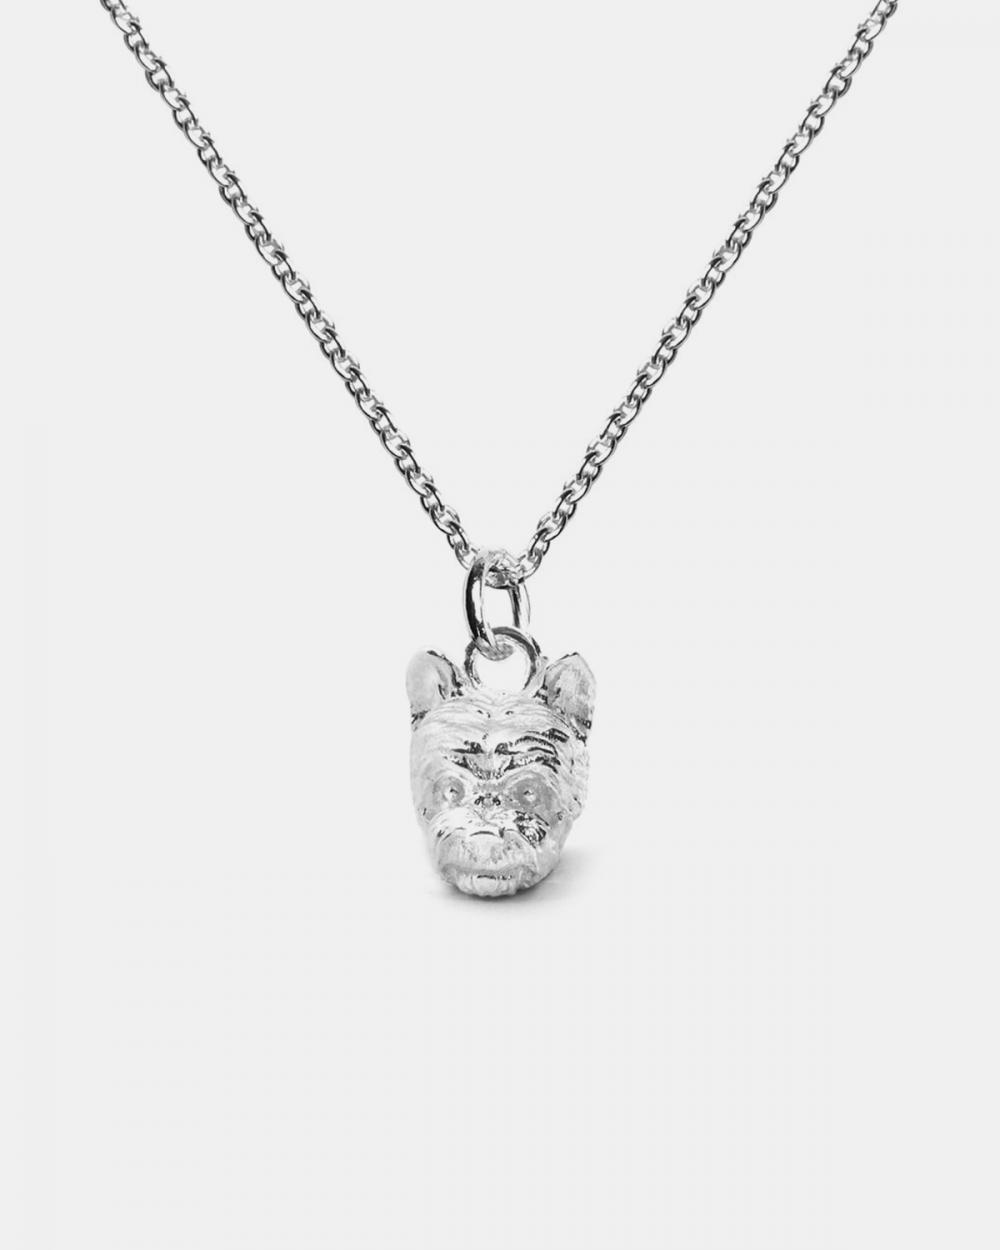 Necklaces YORKSHIRE PENDANT NECKLACE F040 L60 / POLISHED SILVER NOVE25